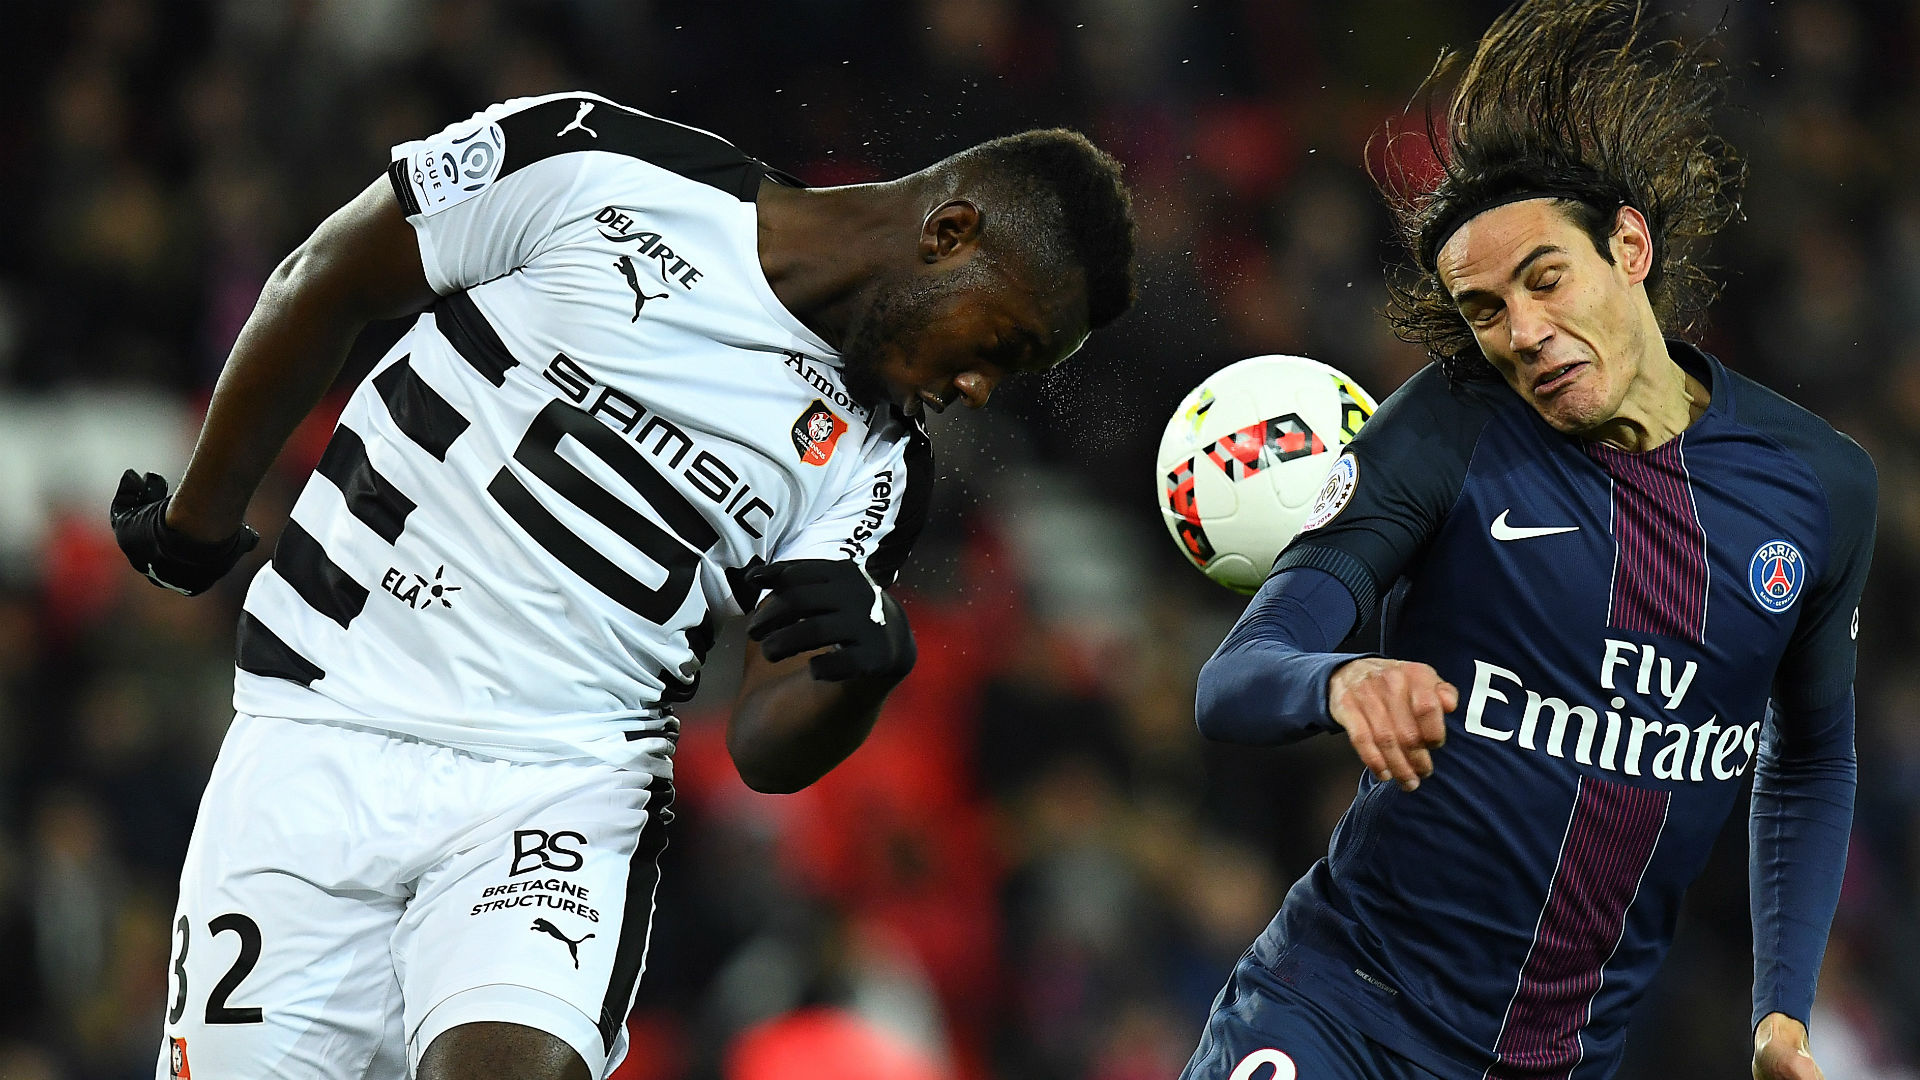 Edinson Cavani Joris Gnagnon Paris SG Rennes Ligue 1 06112016